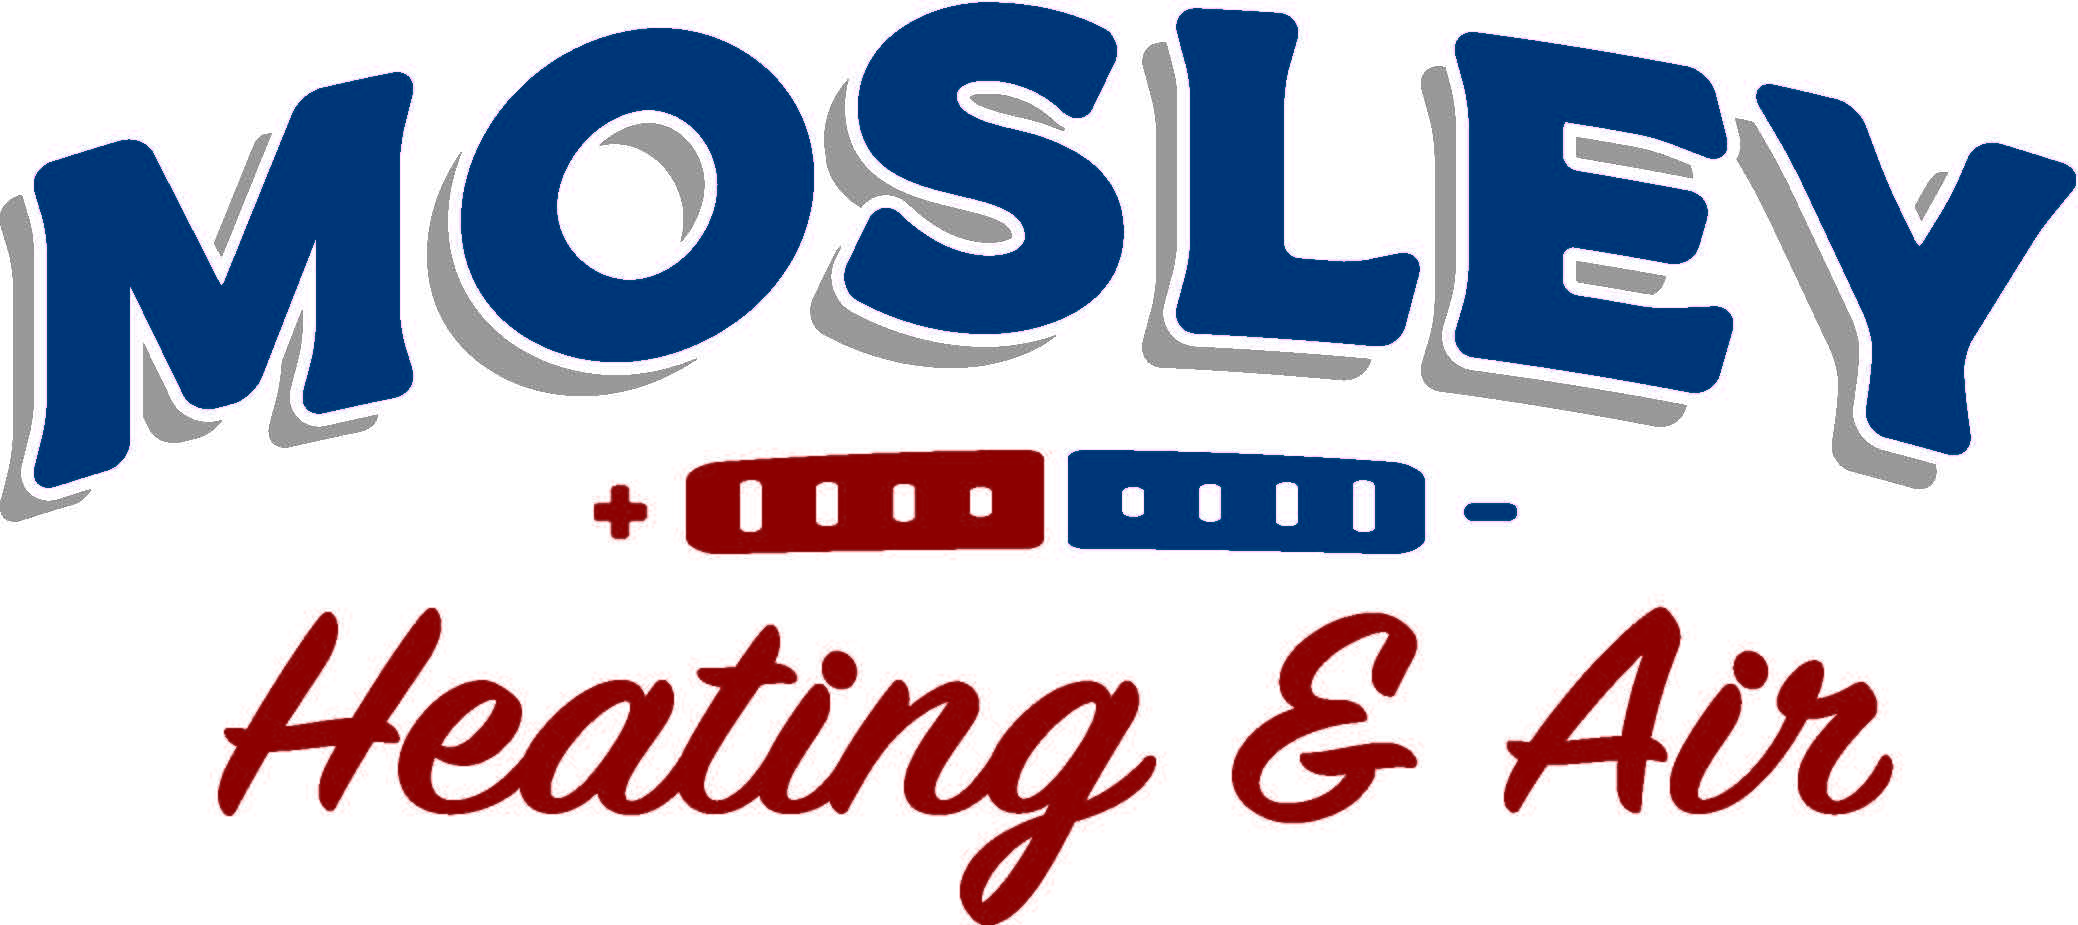 Mosley-Heating Air Gala2021